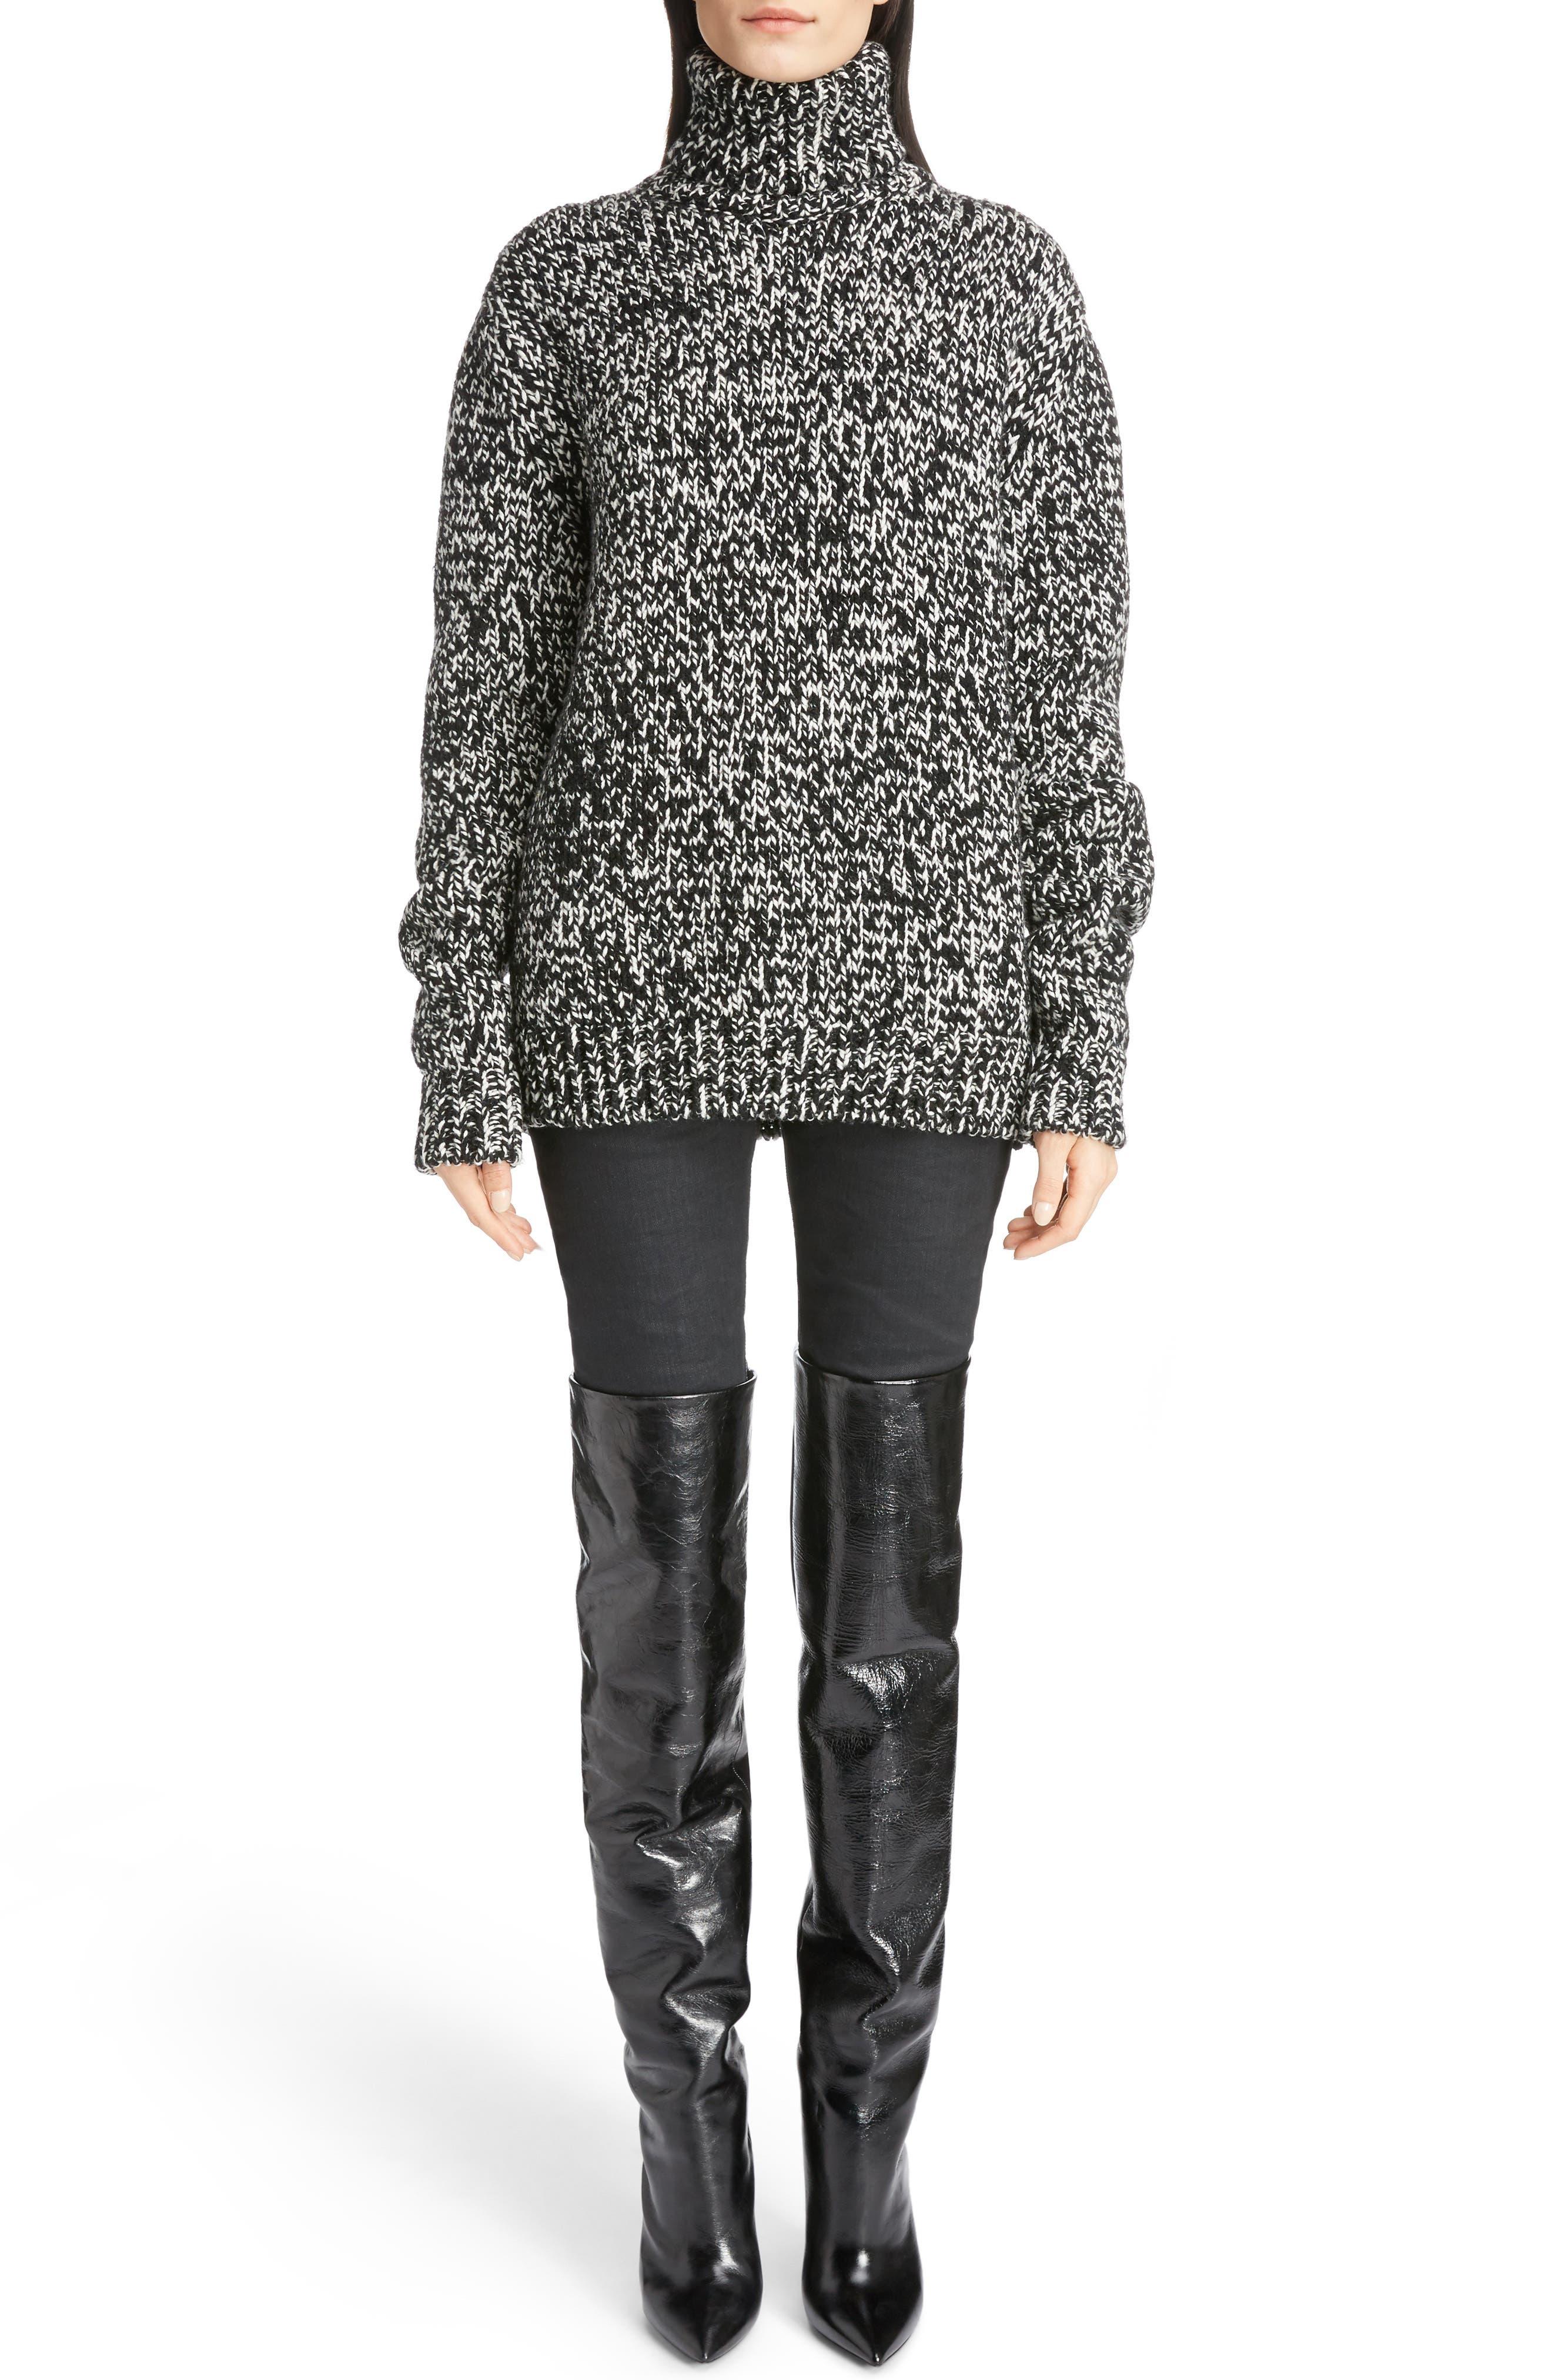 Alternate Image 1 Selected - Saint Laurent Mélange Knit Wool Turtleneck Sweater